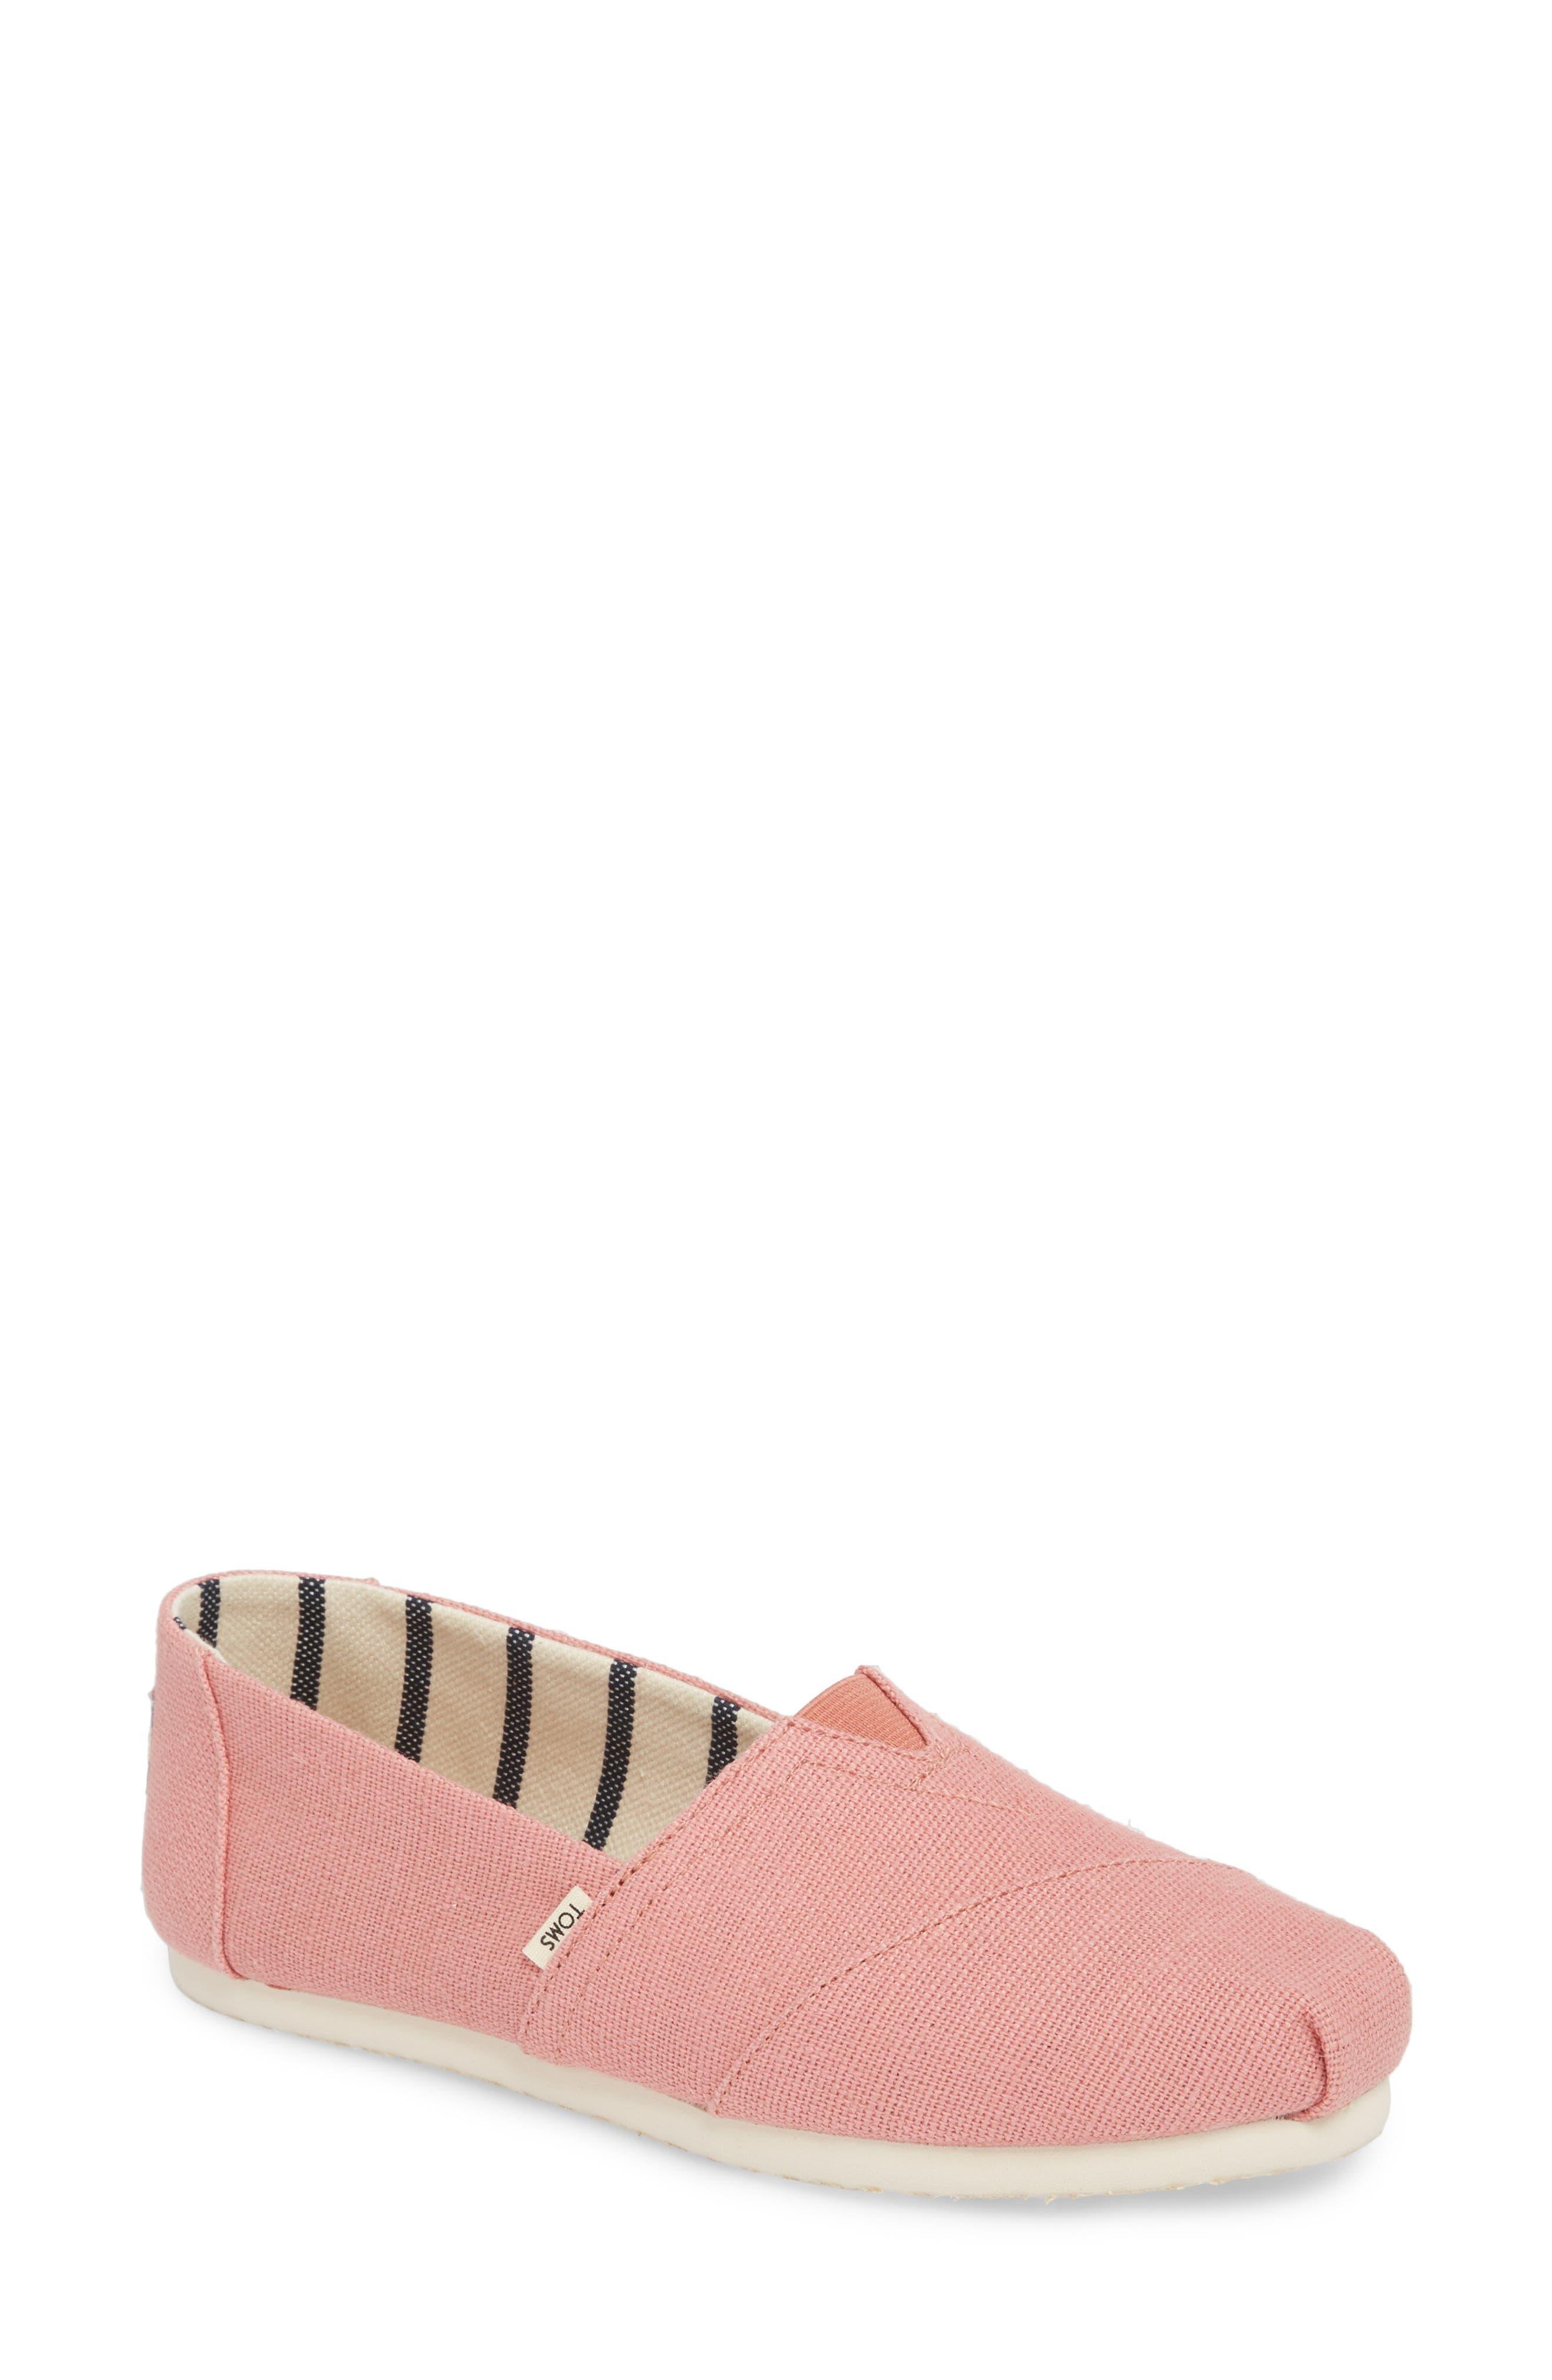 Toms Alpargata Slip-On, Pink